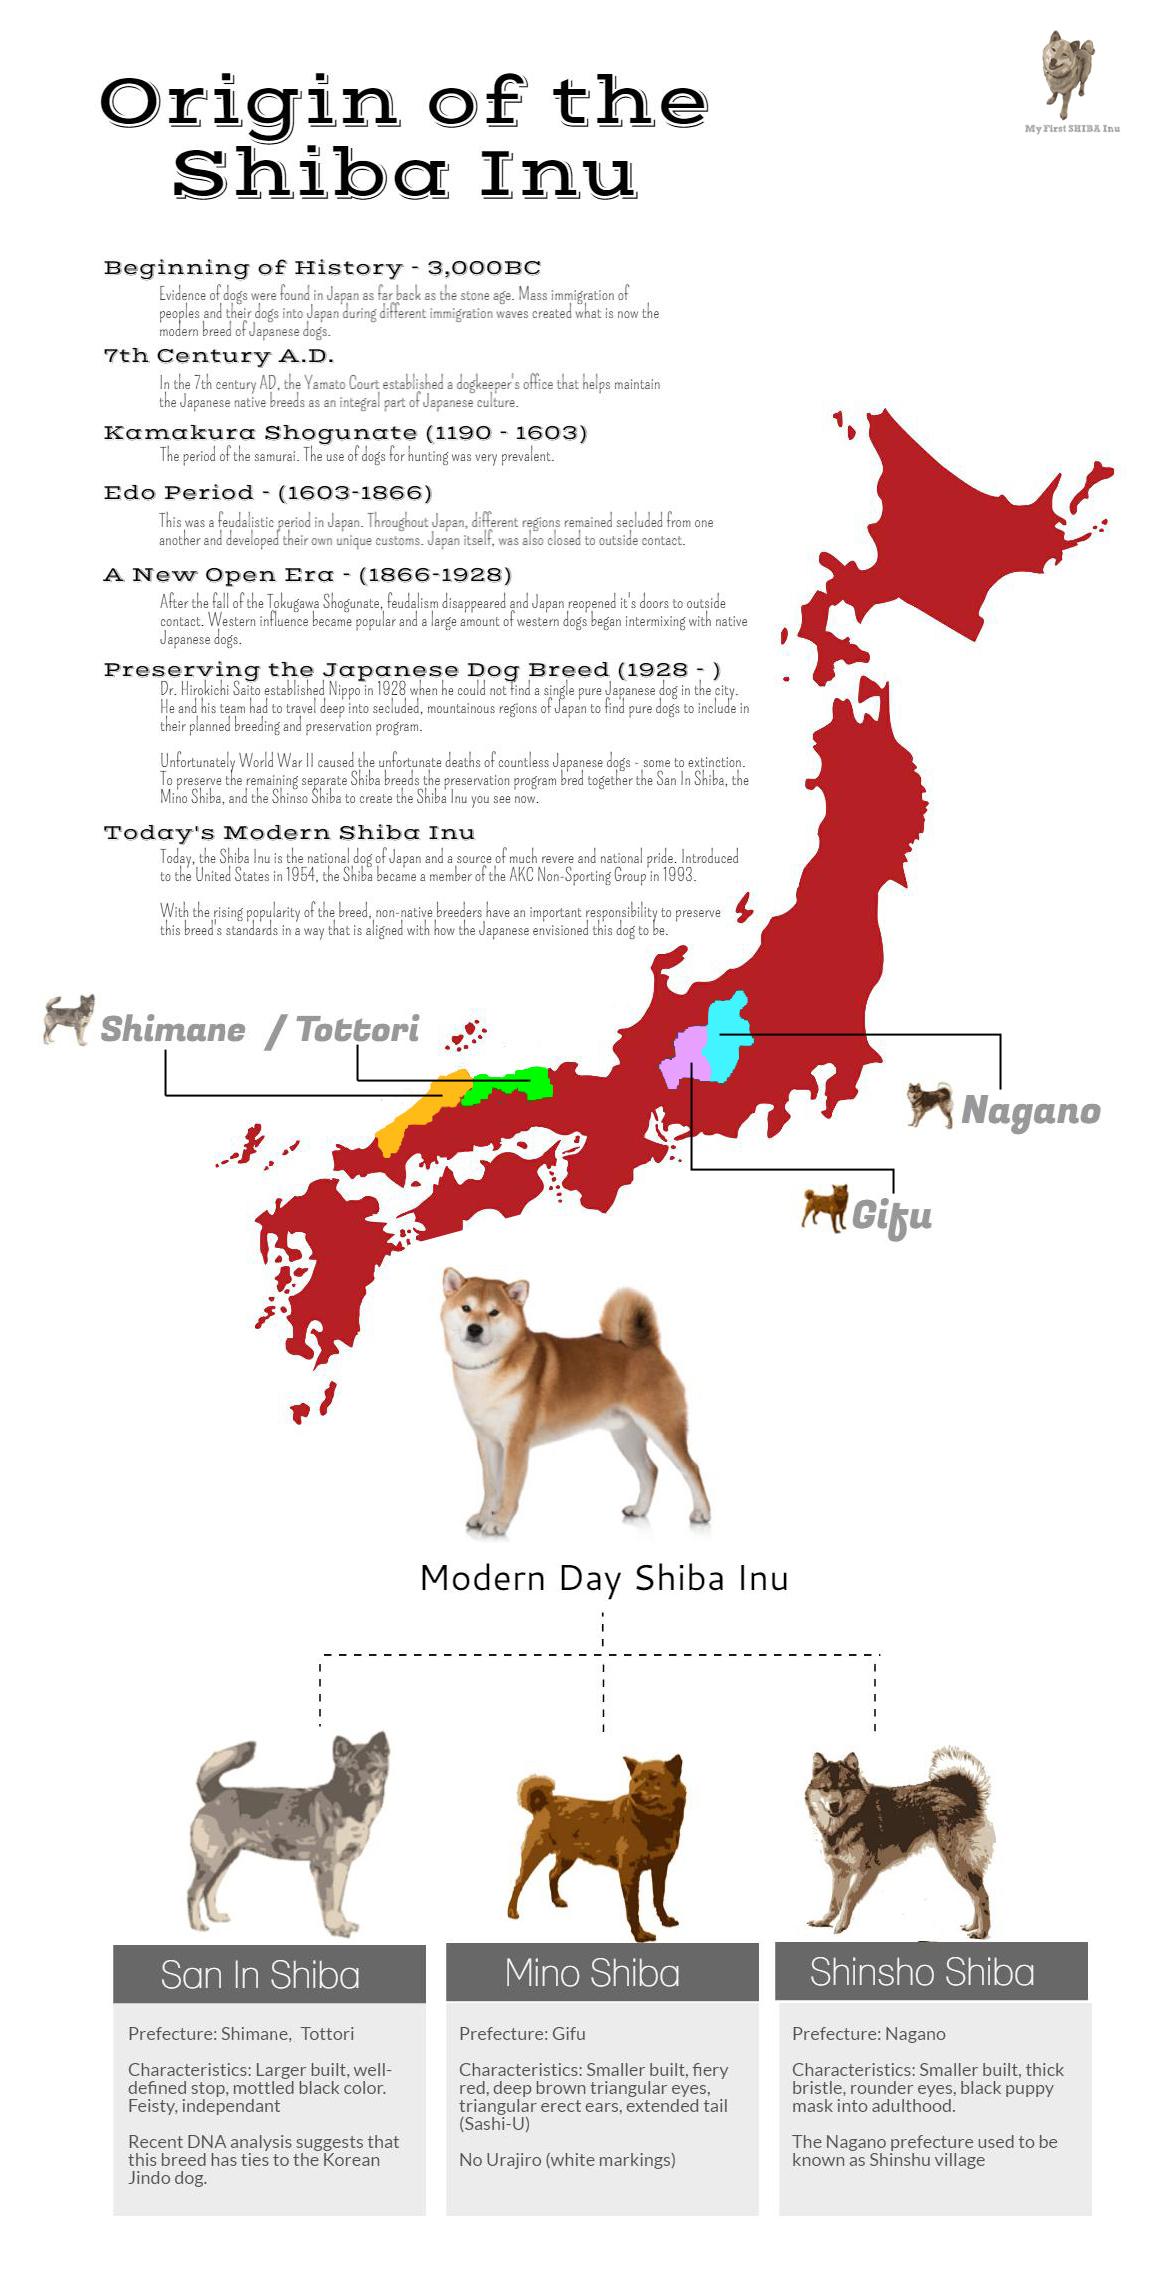 shiba inu history and origins infographic